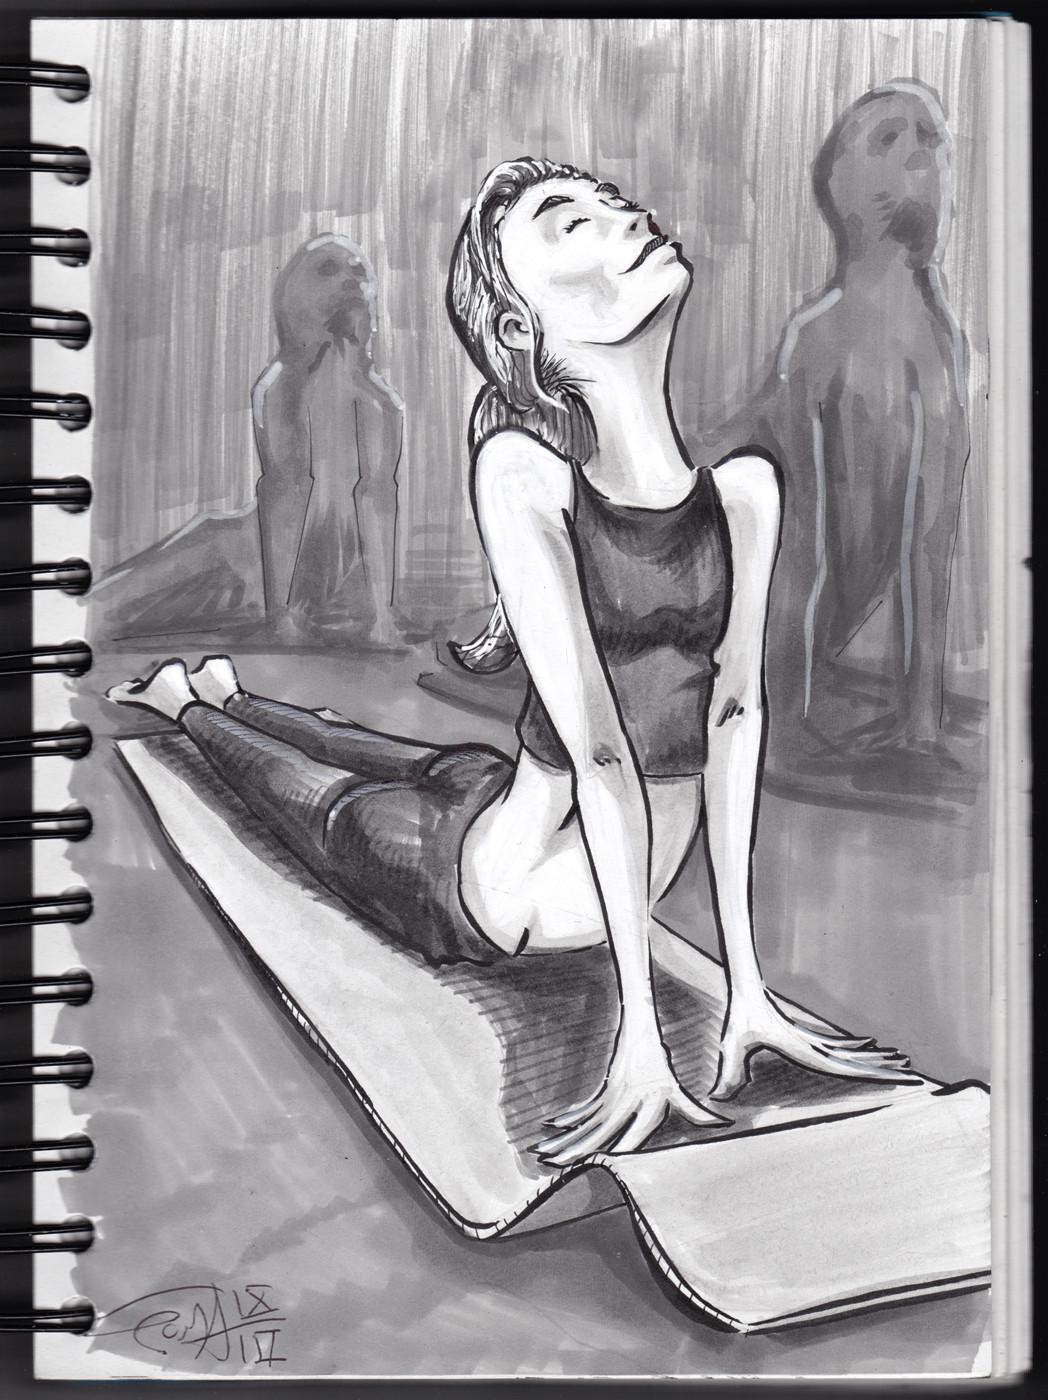 26.Stretch